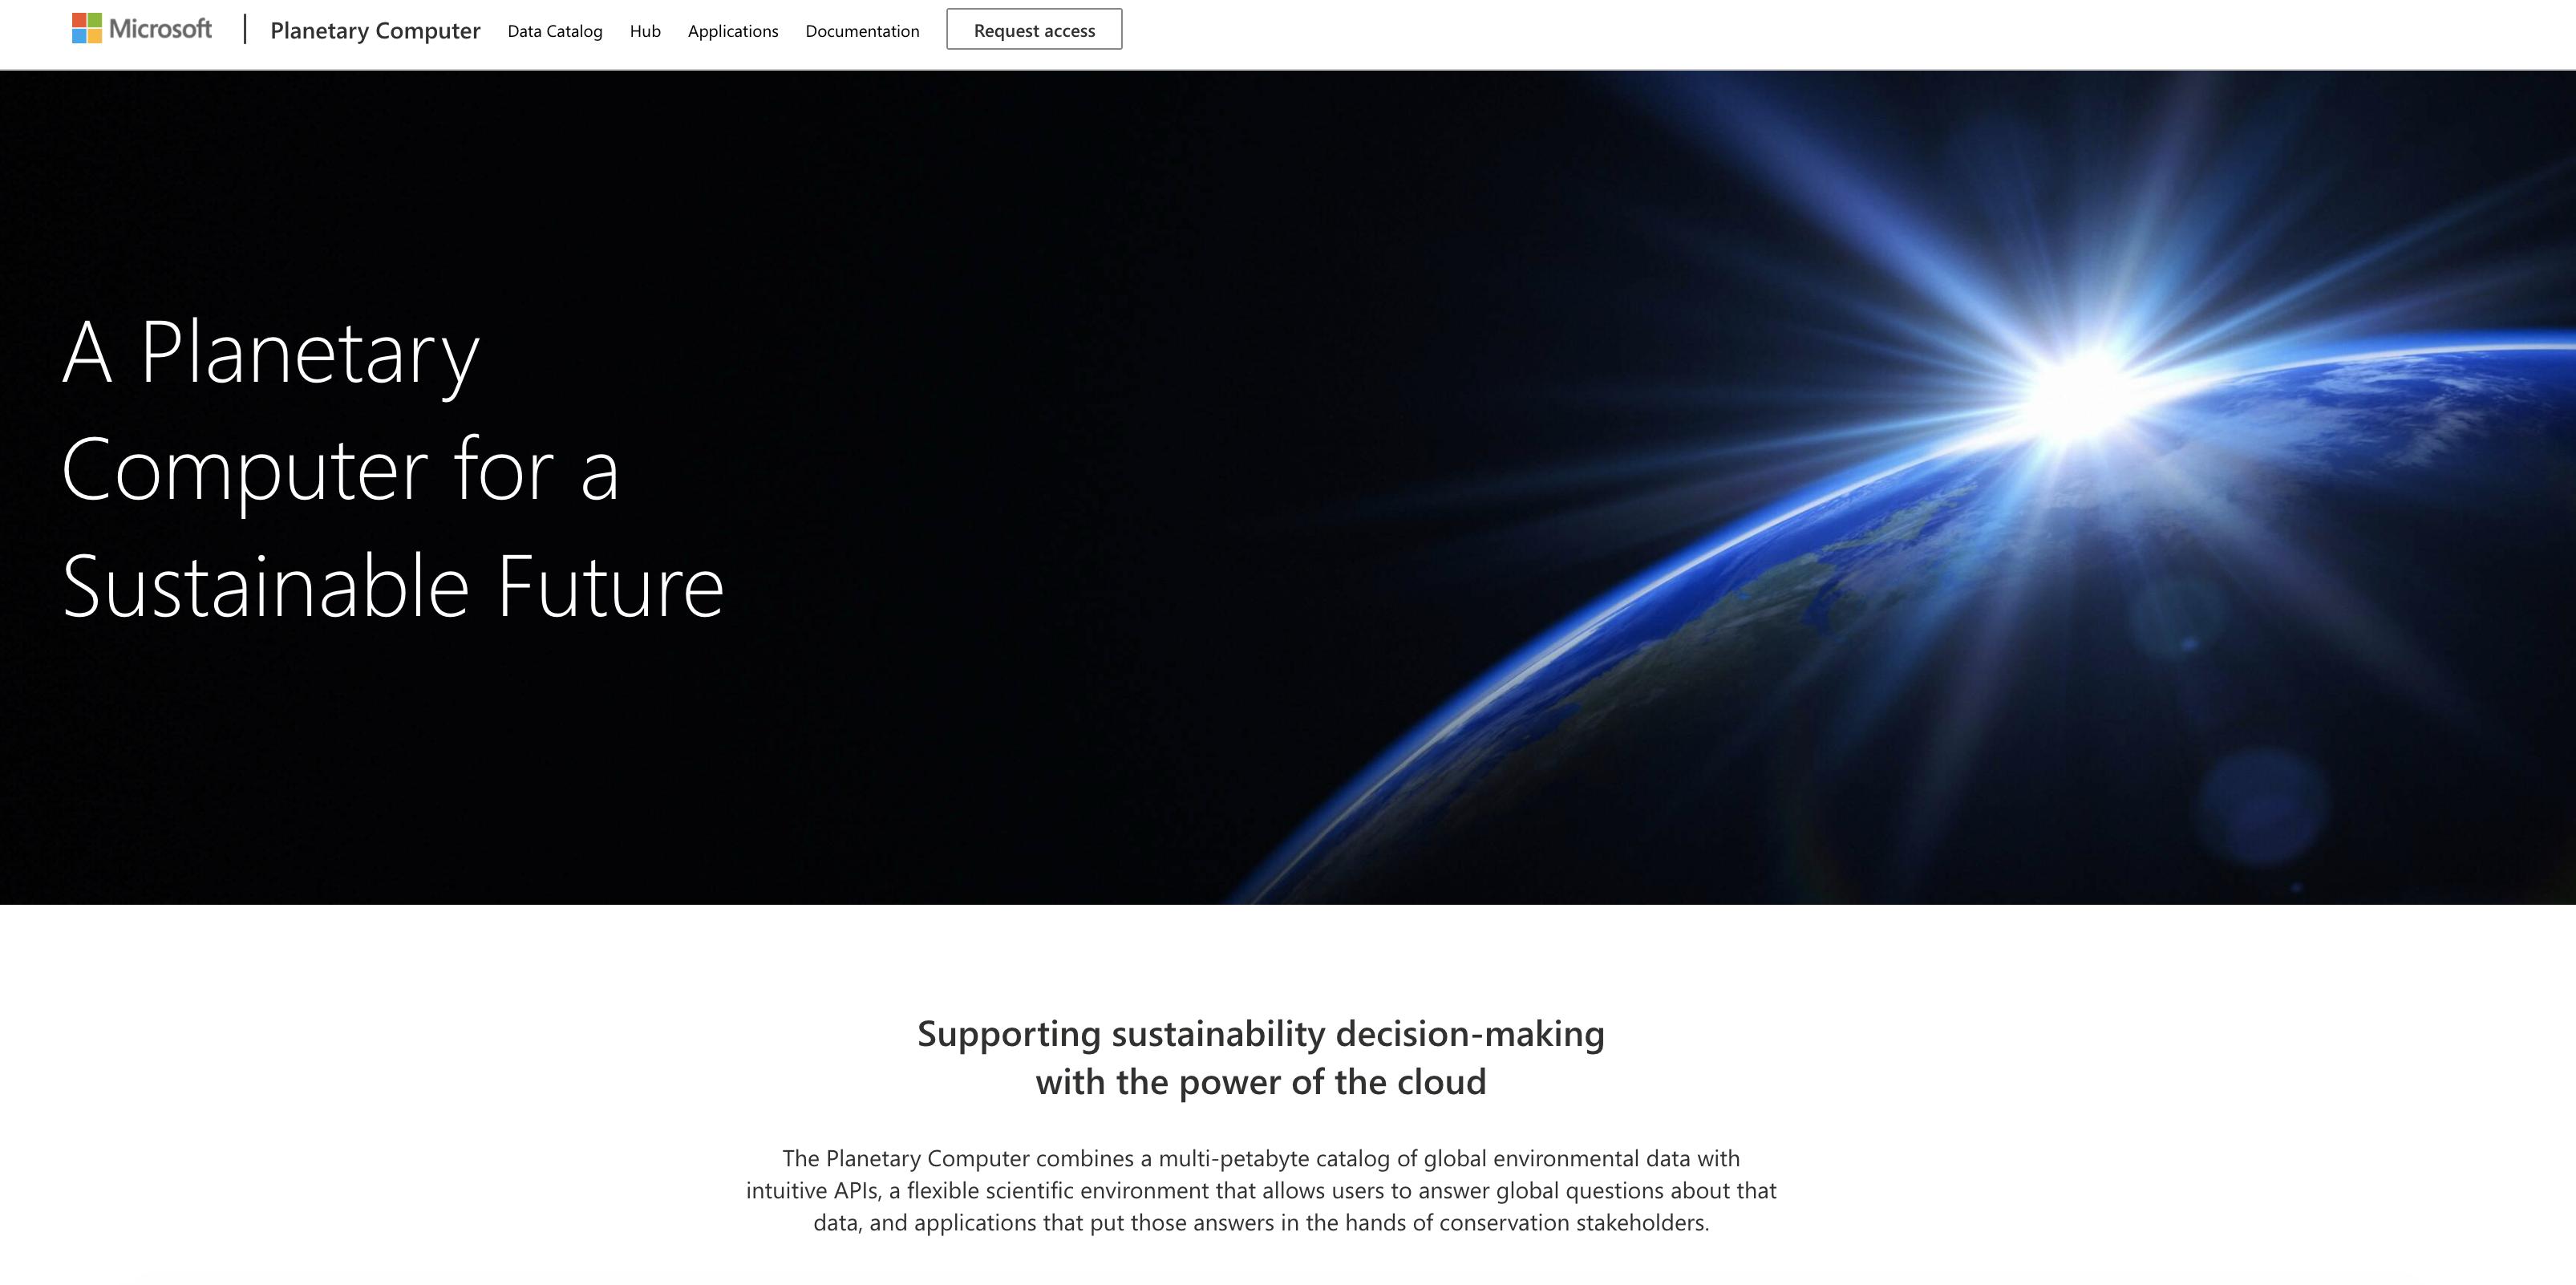 Screenshot of Microsoft Planetary Computer landing page